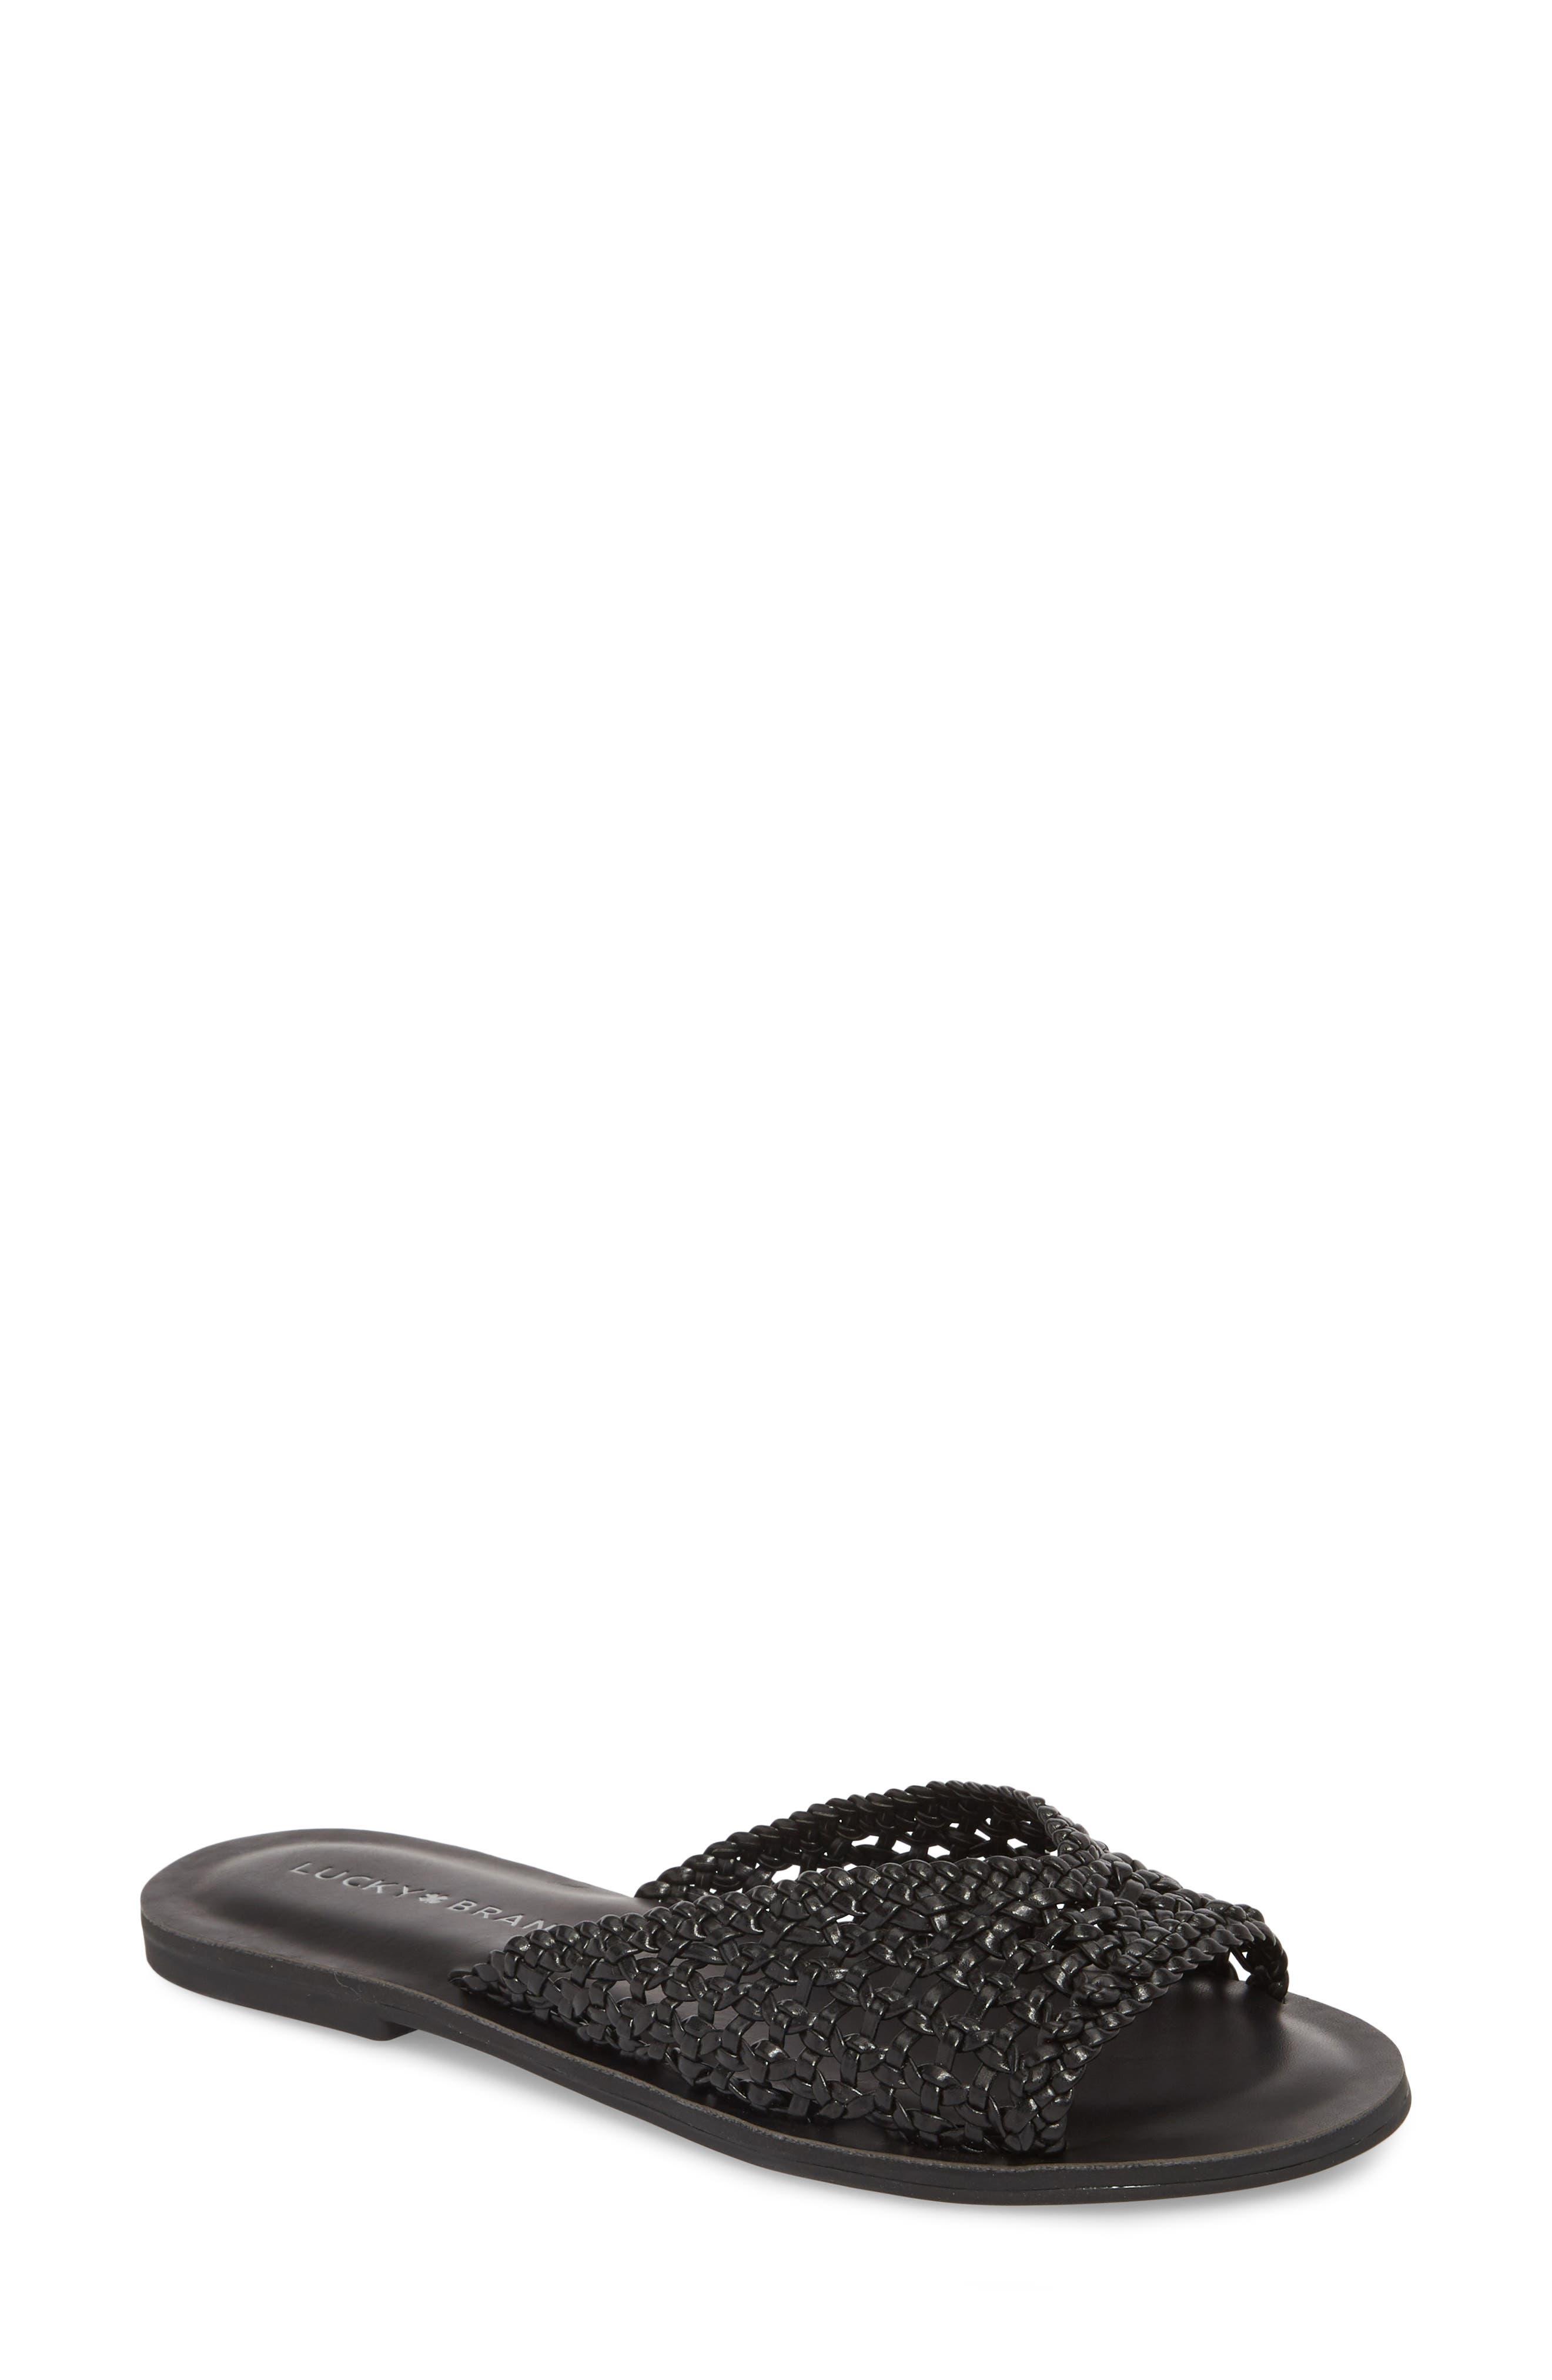 Adola Slide Sandal,                             Main thumbnail 1, color,                             BLACK LEATHER